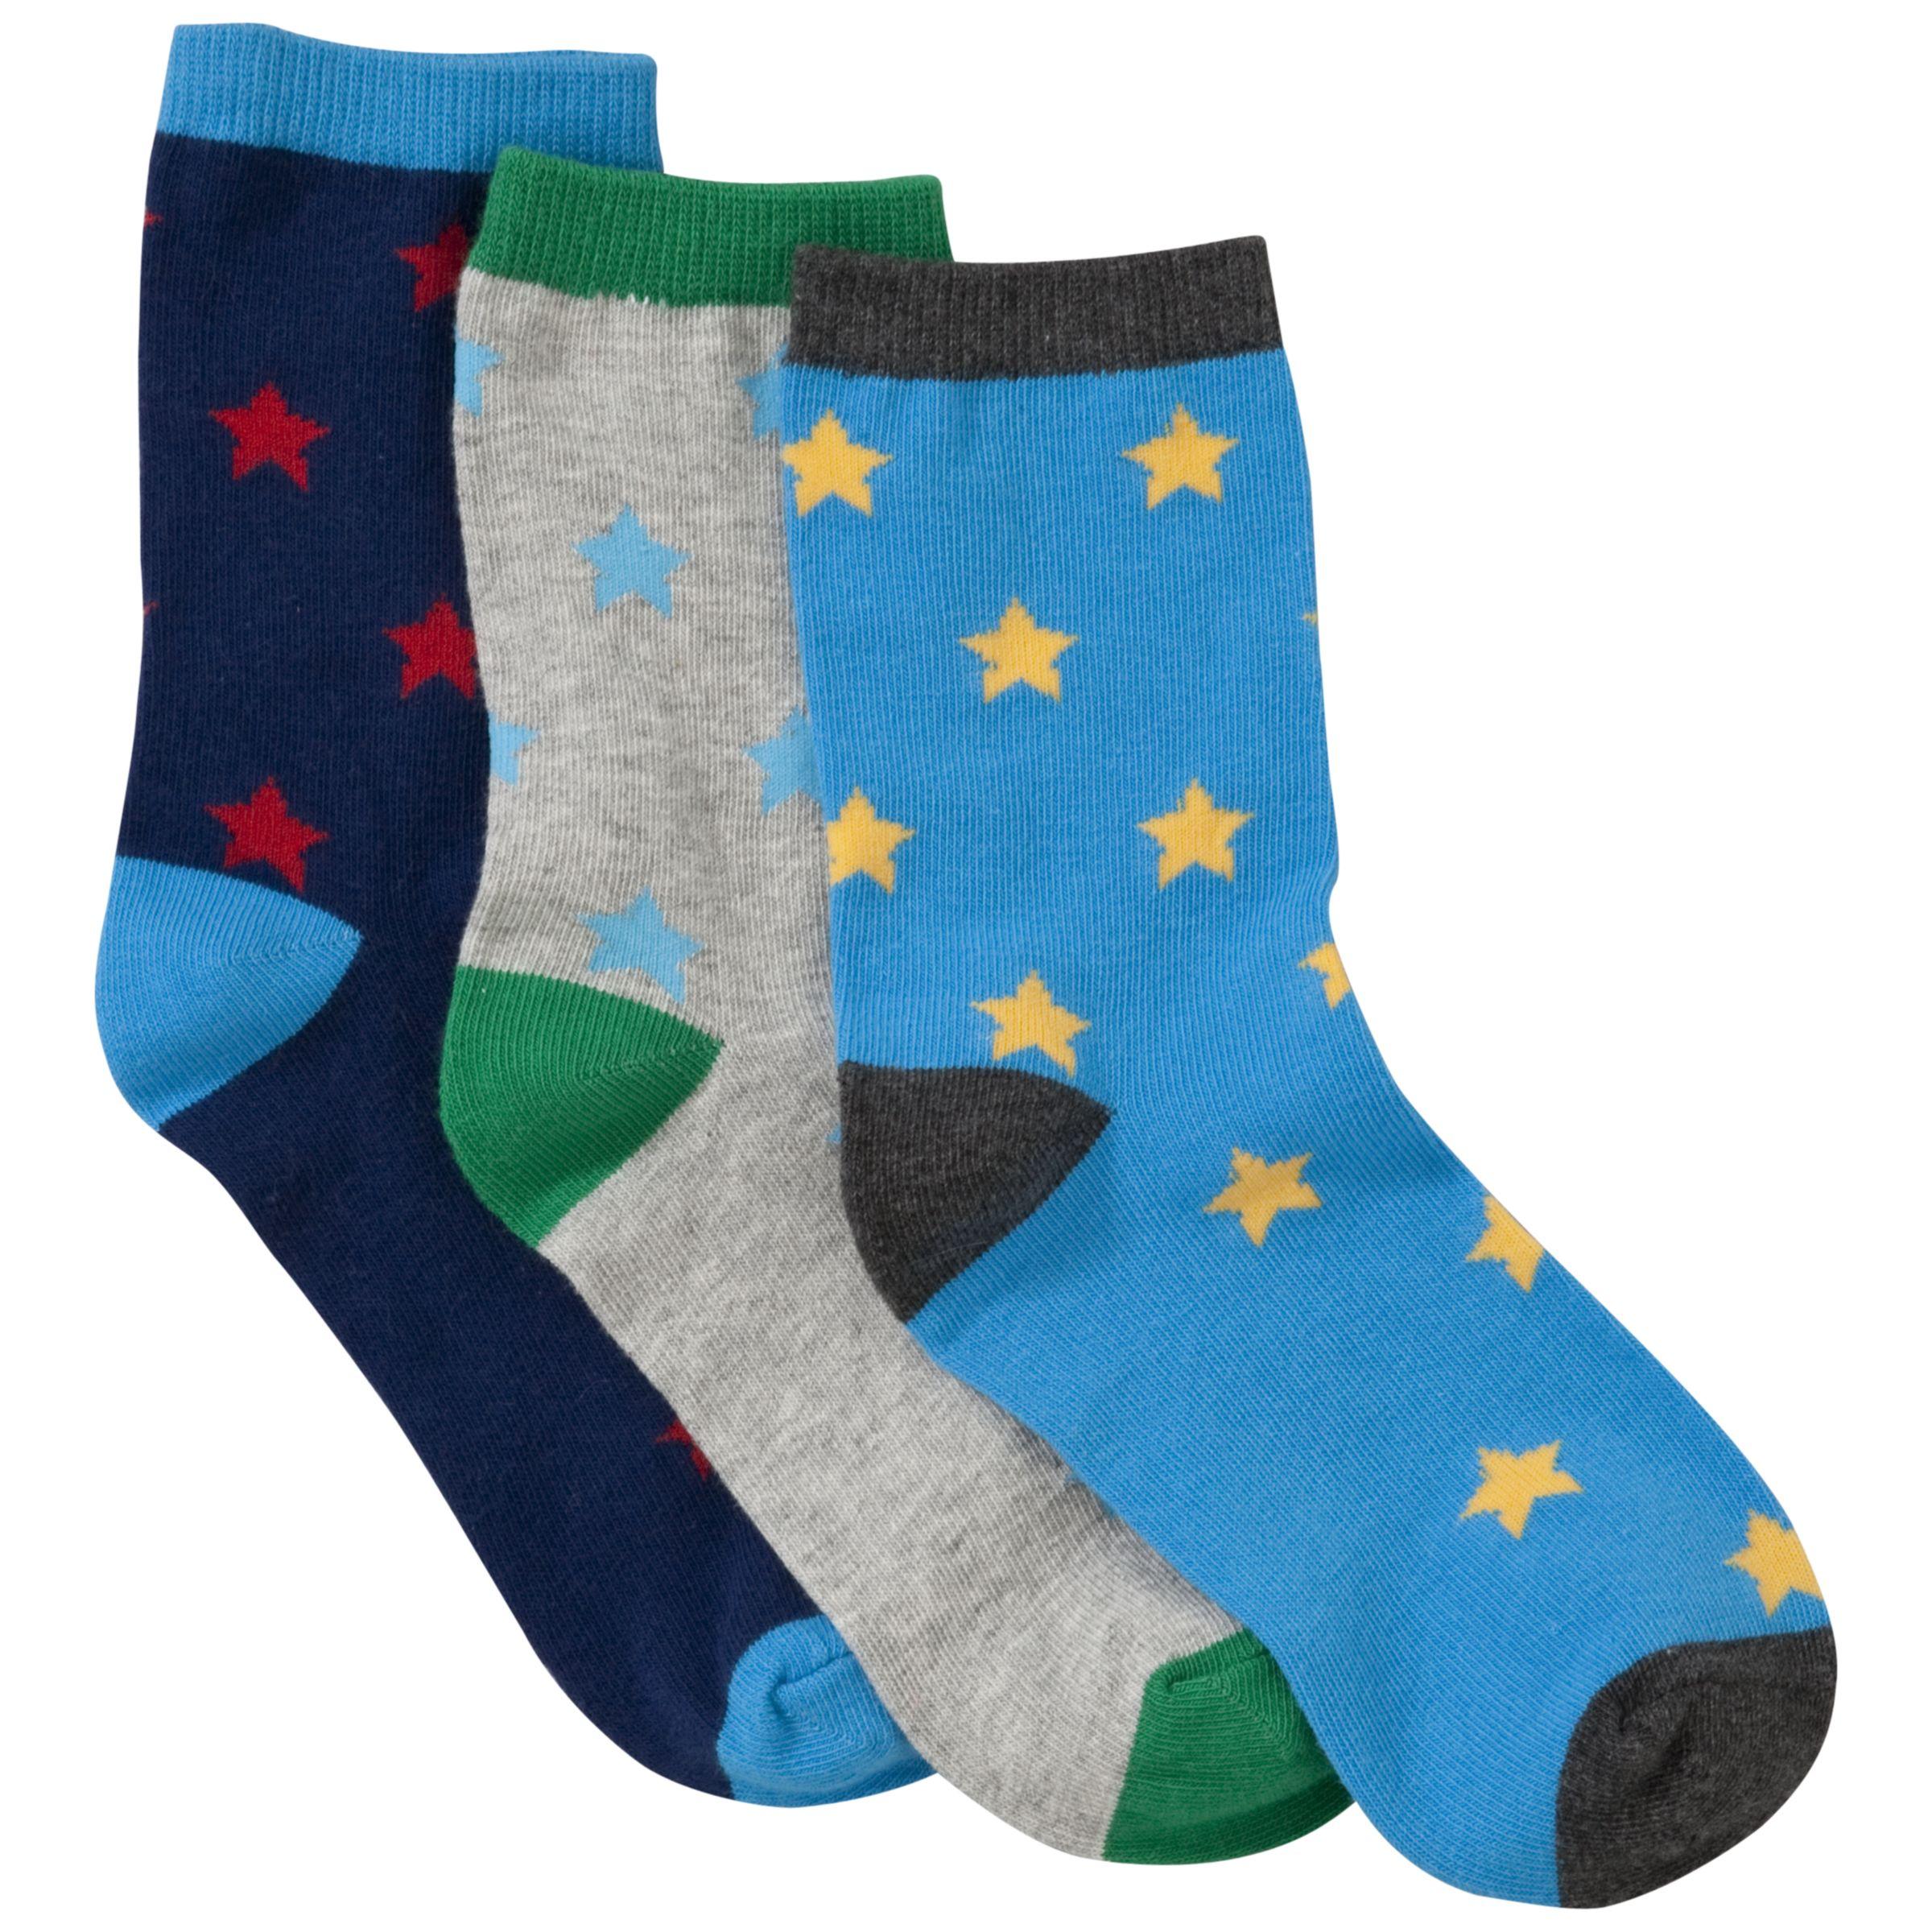 John Lewis Boy Star Socks, Pack of 3, Brights